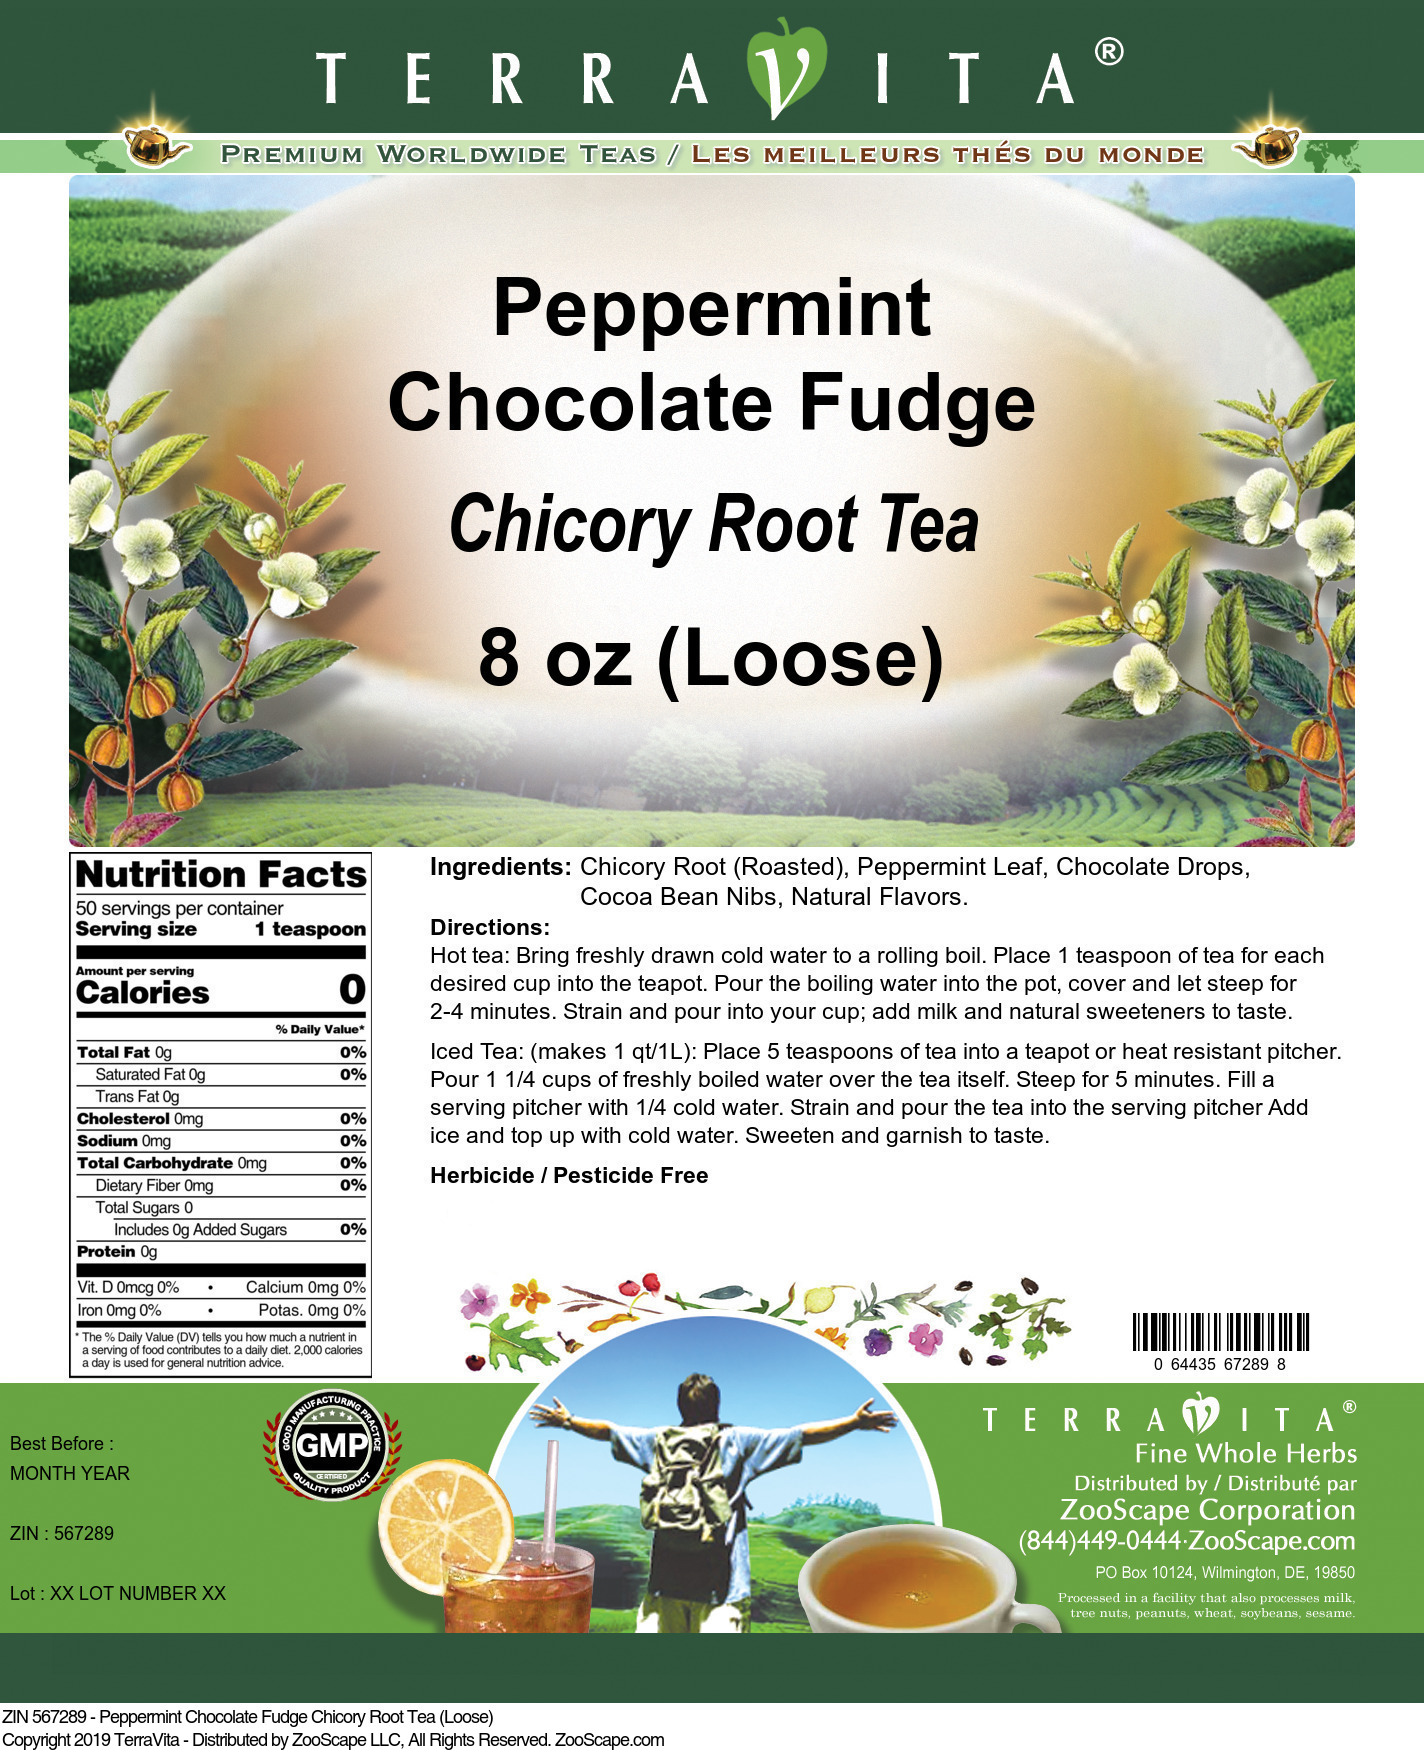 Peppermint Chocolate Fudge Chicory Root